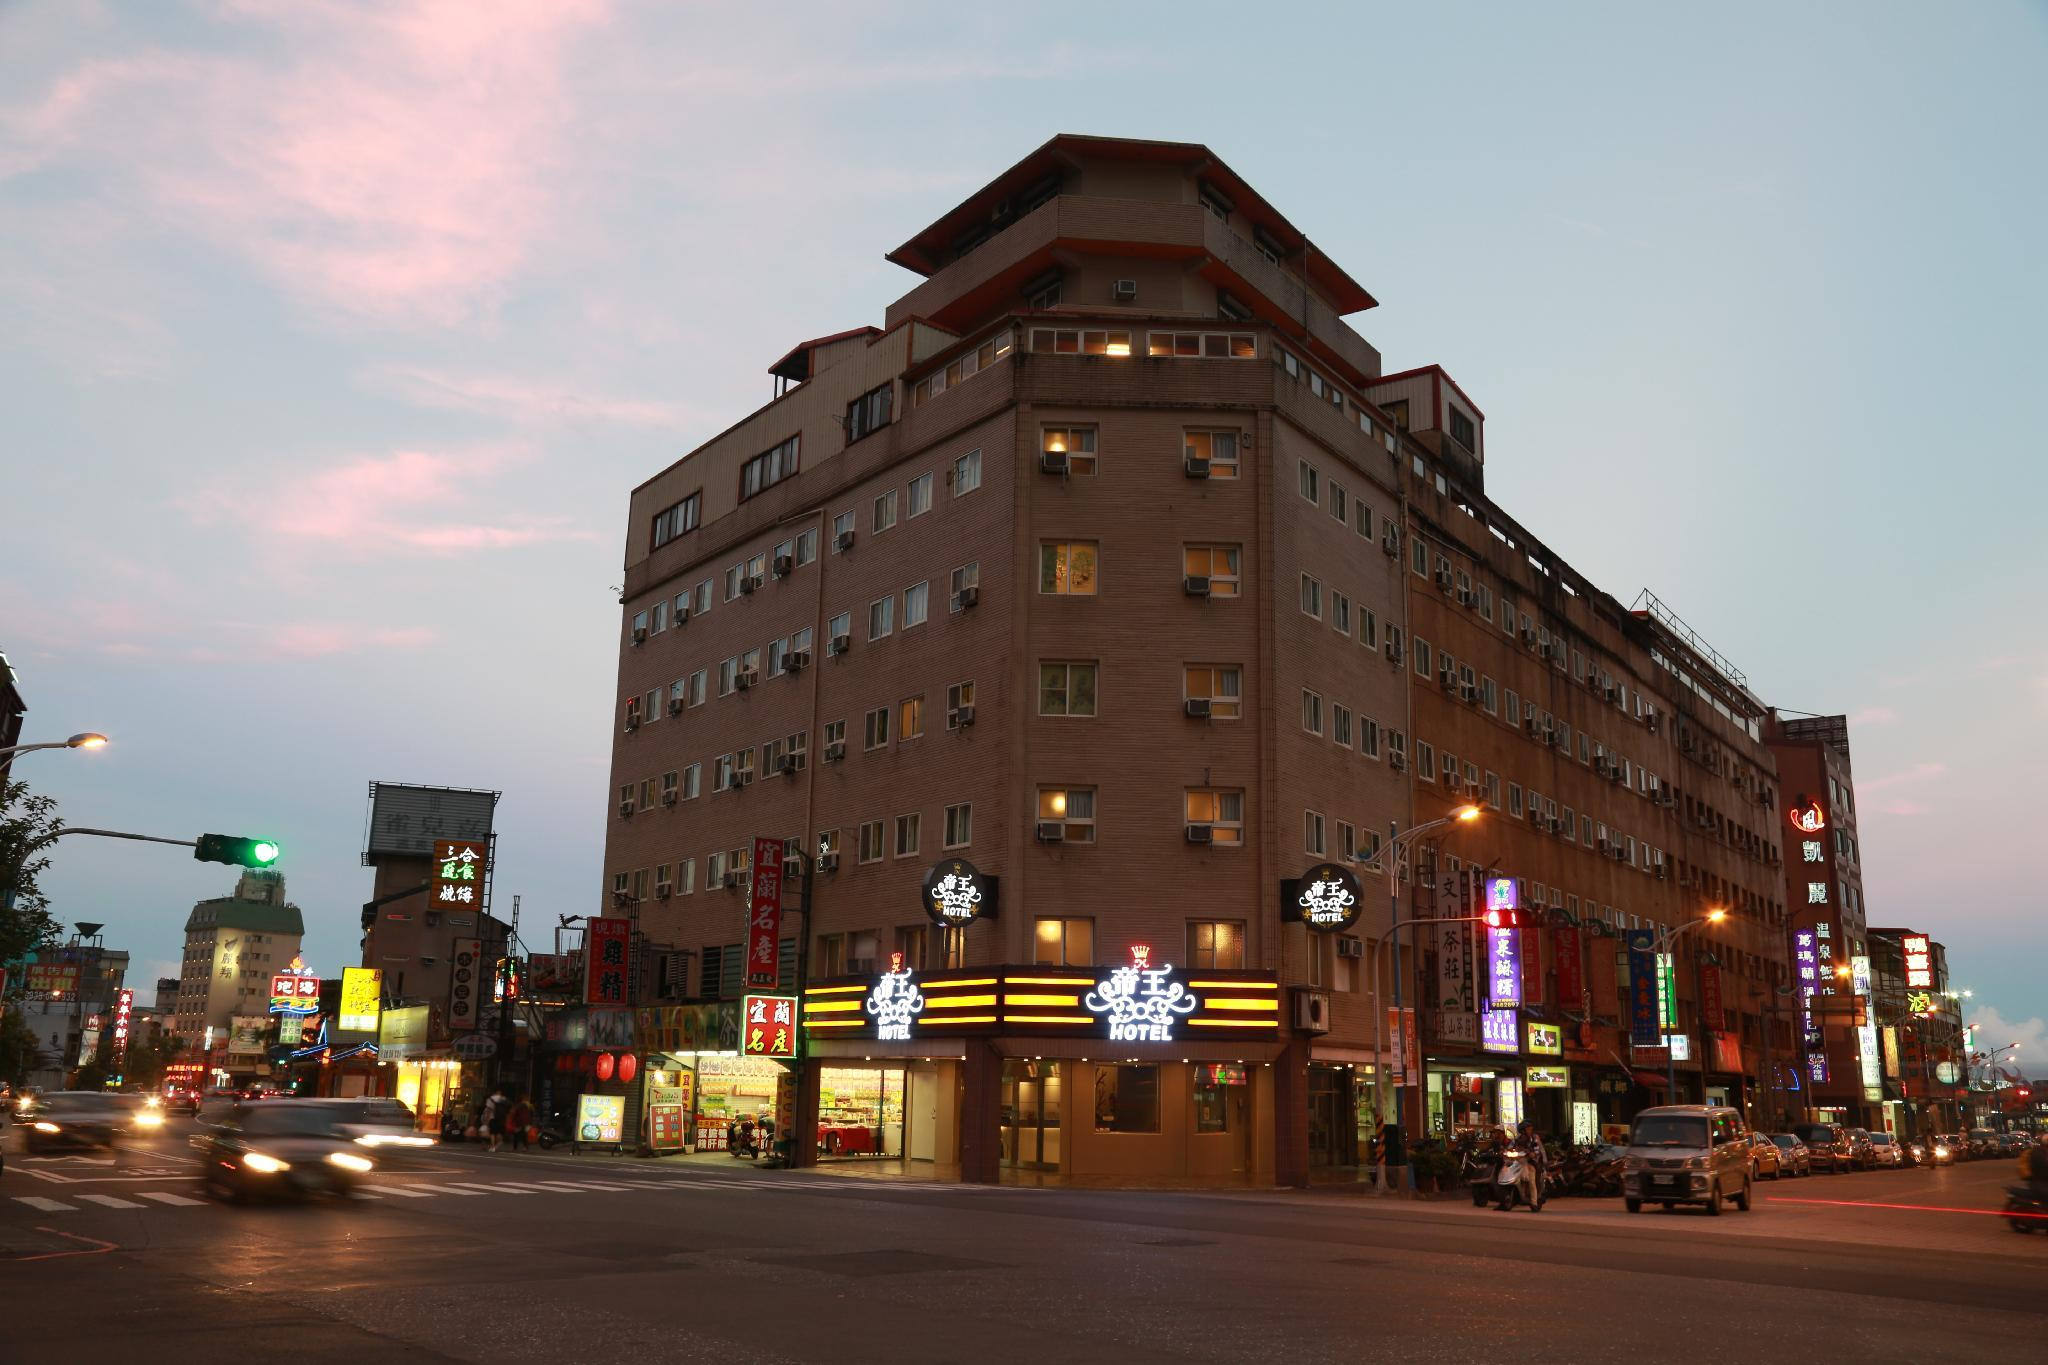 Jiaoxi King Hot Spring Hotel